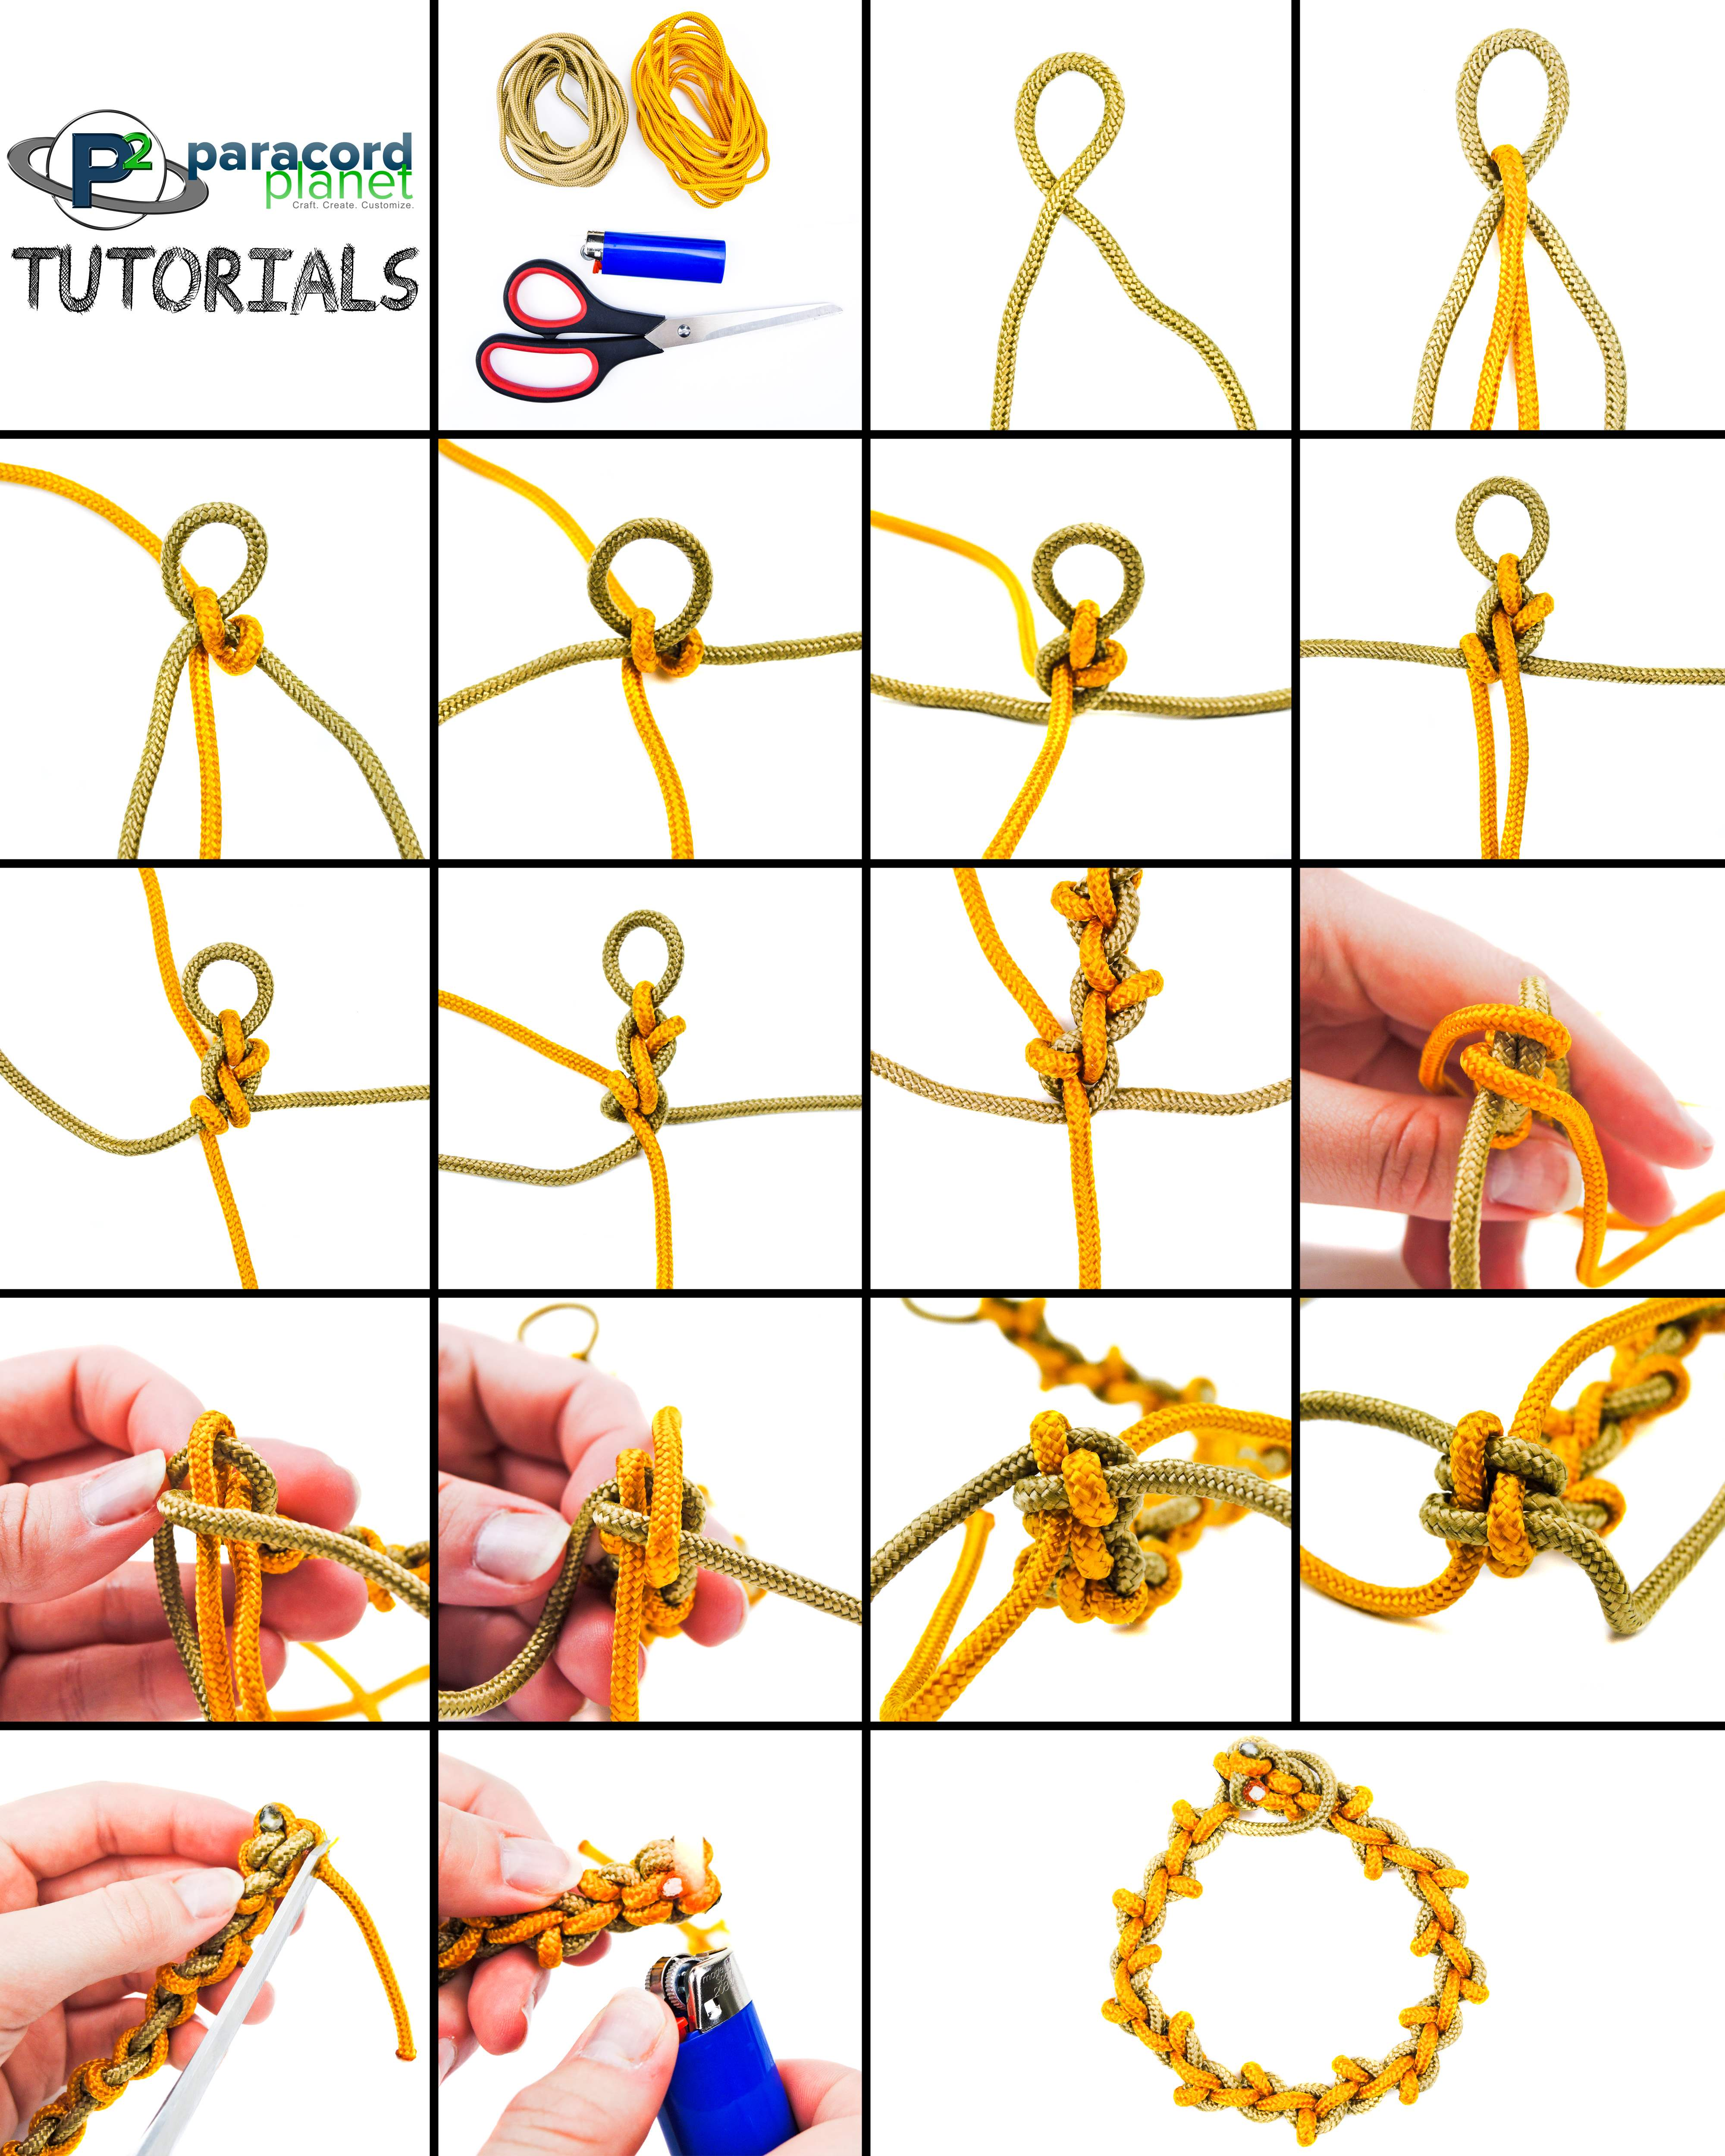 Paracord Wheat Stalk Bracelet photo tutorial